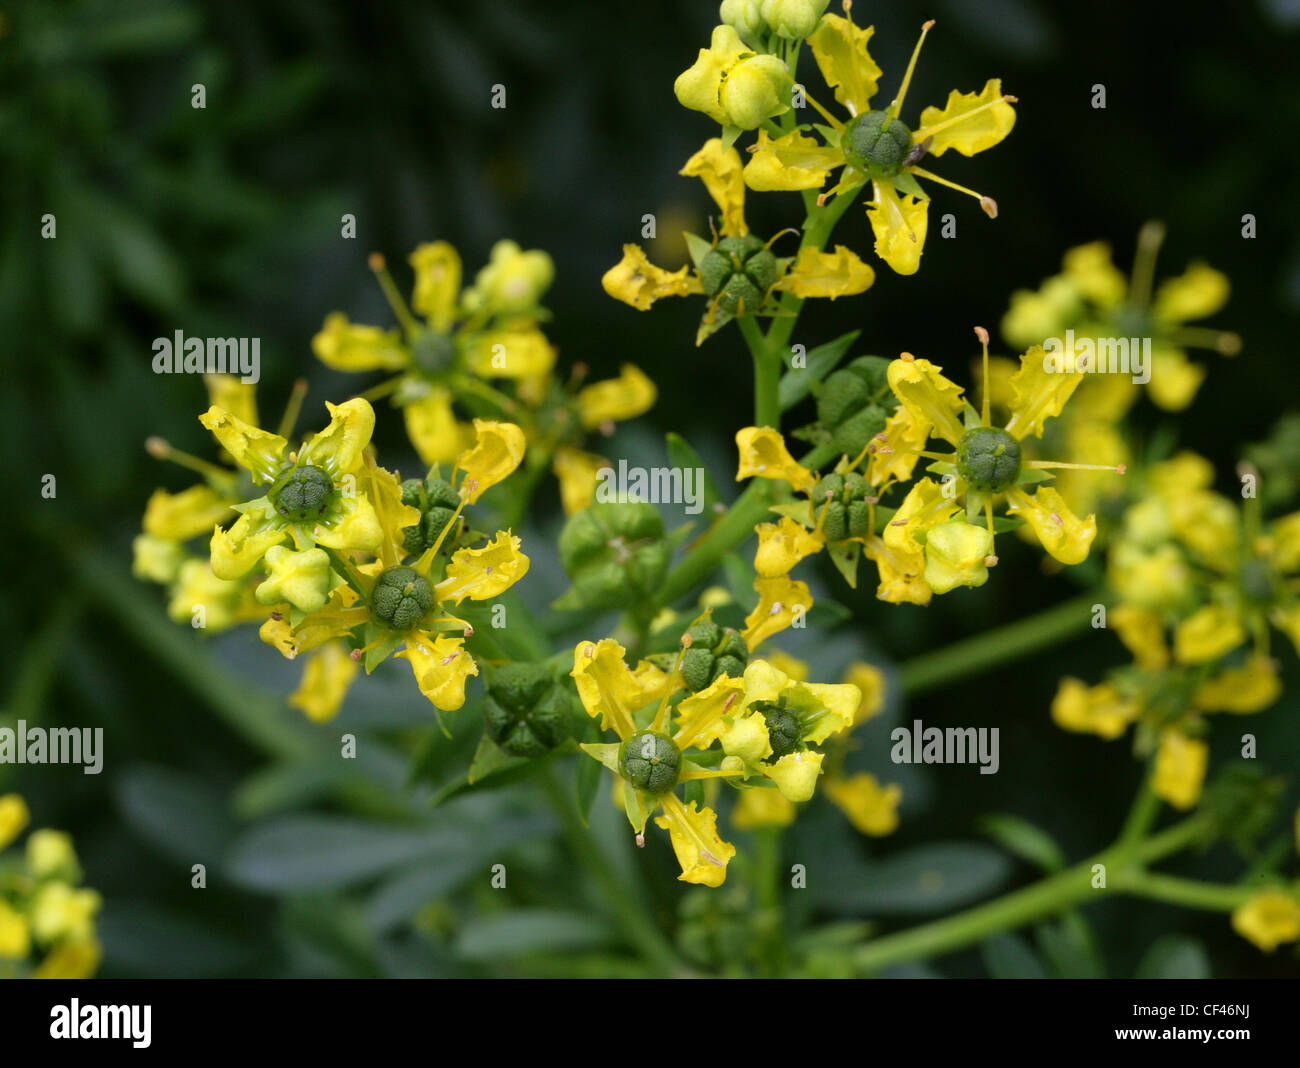 Common or Garden Rue, Ruta graveolens, Rutaceae. Aka Herb of Grace, Herbygrass, Meadow Rue, Ruda, Rue, Weinkraut. - Stock Image